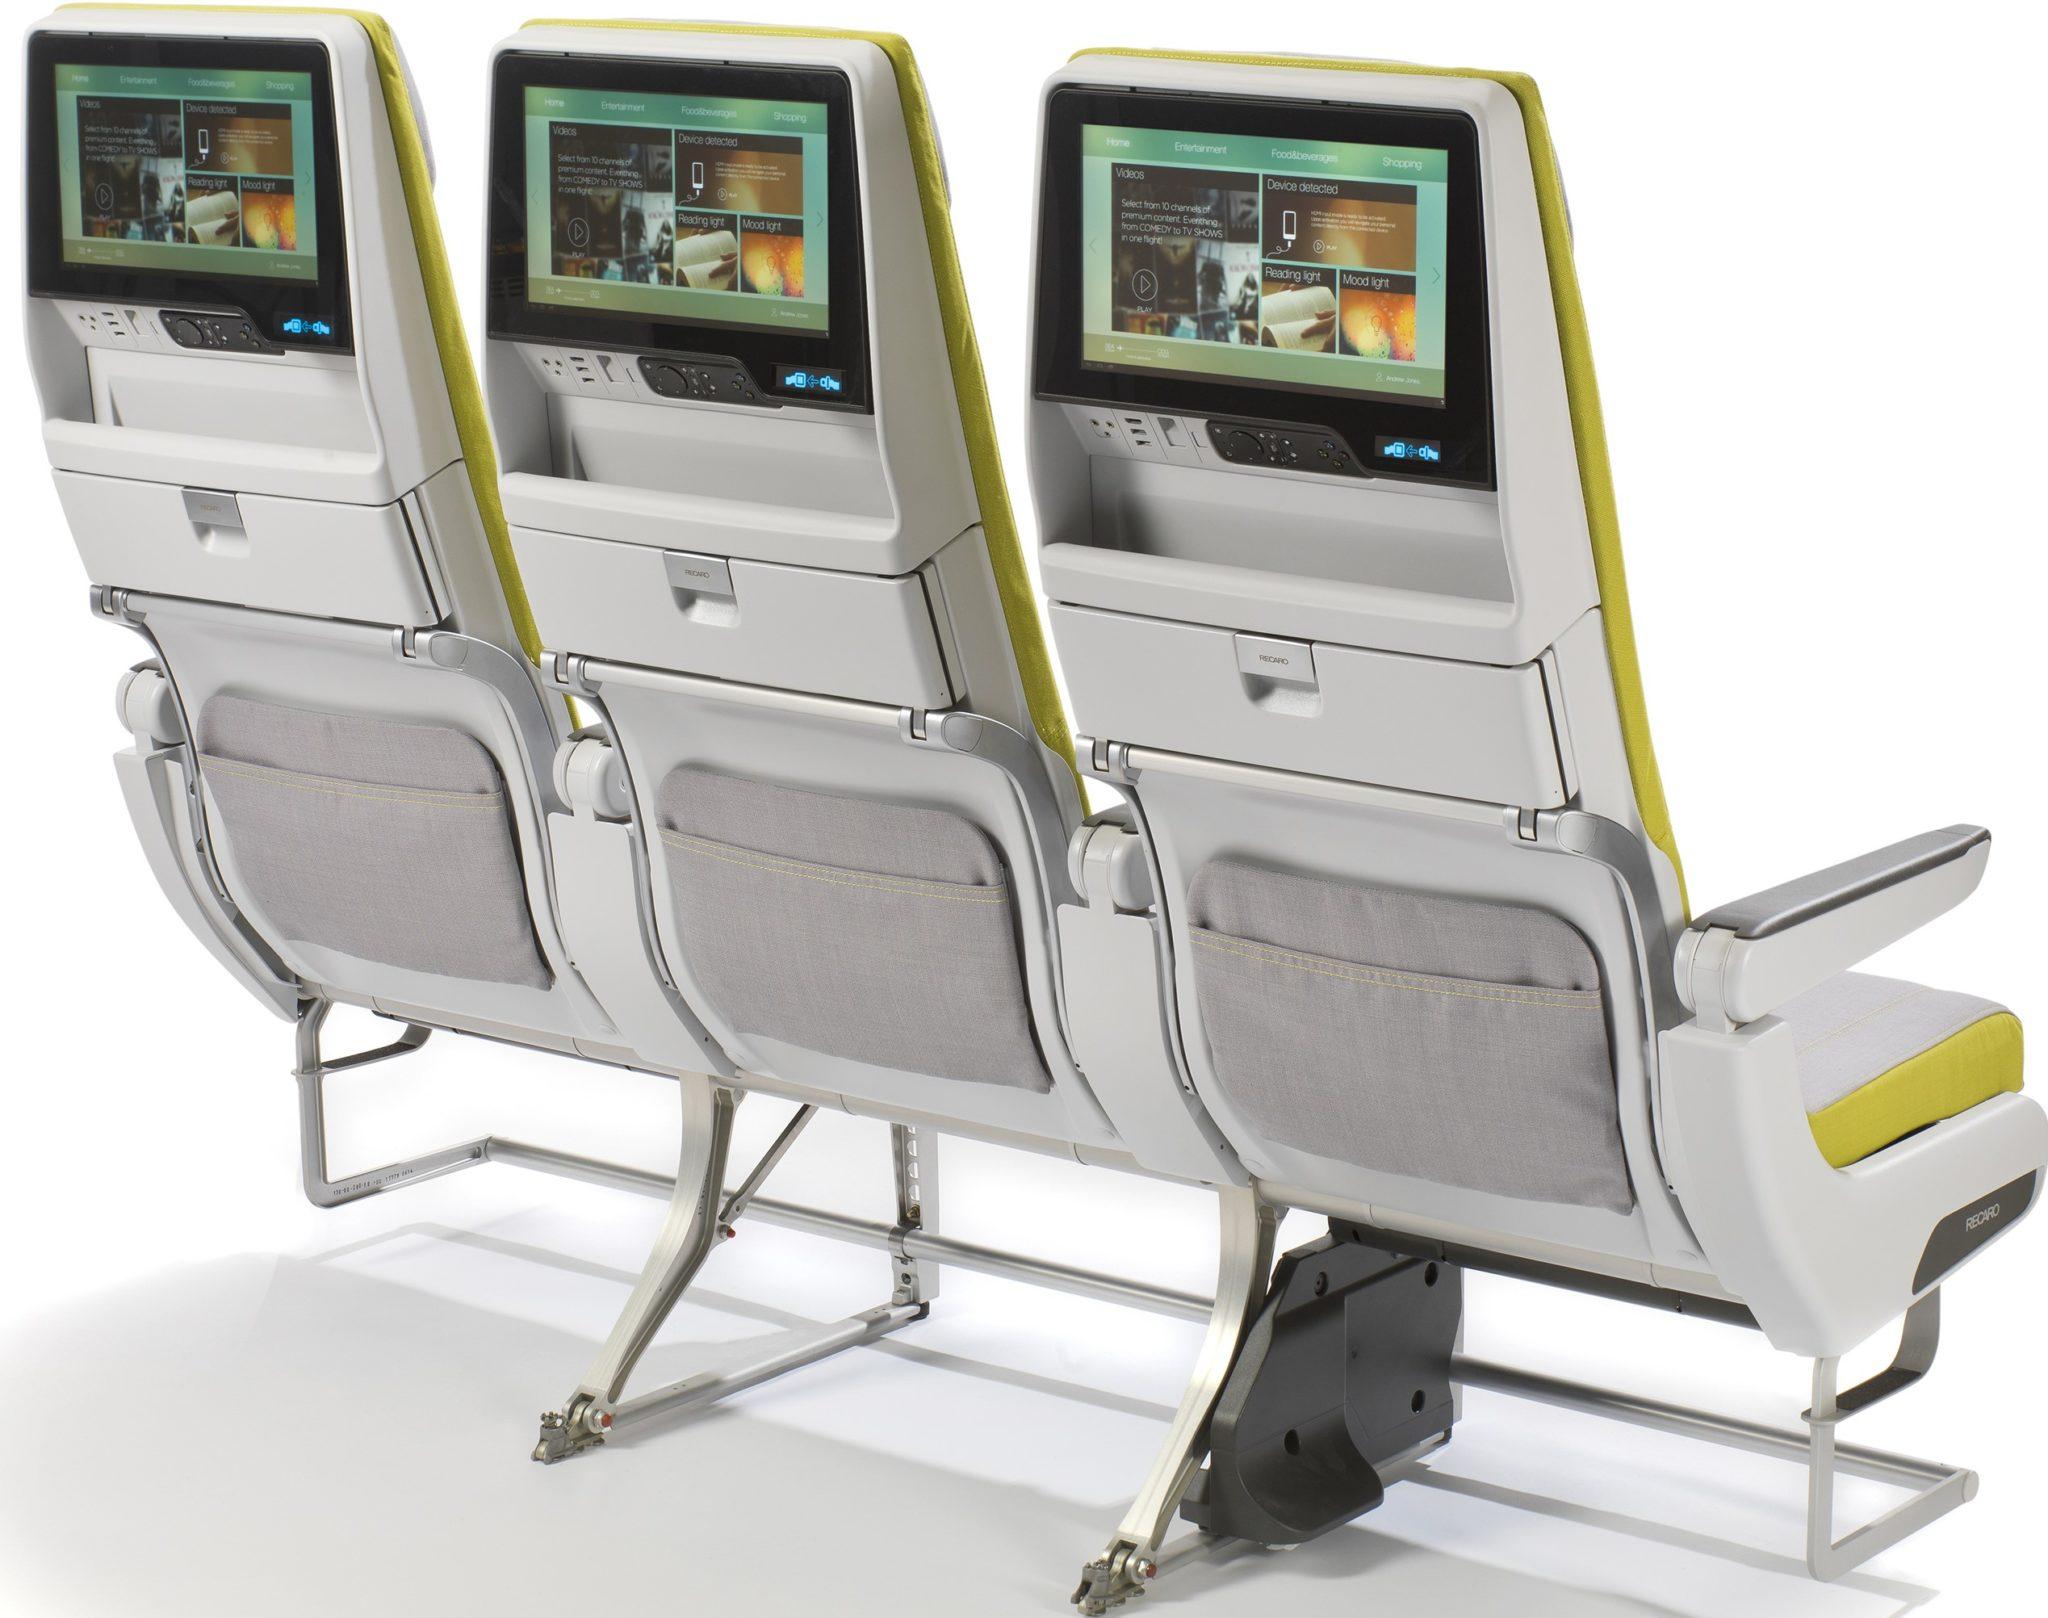 Recaro's CL3710 is a fully featured economy seat. Image: Recaro